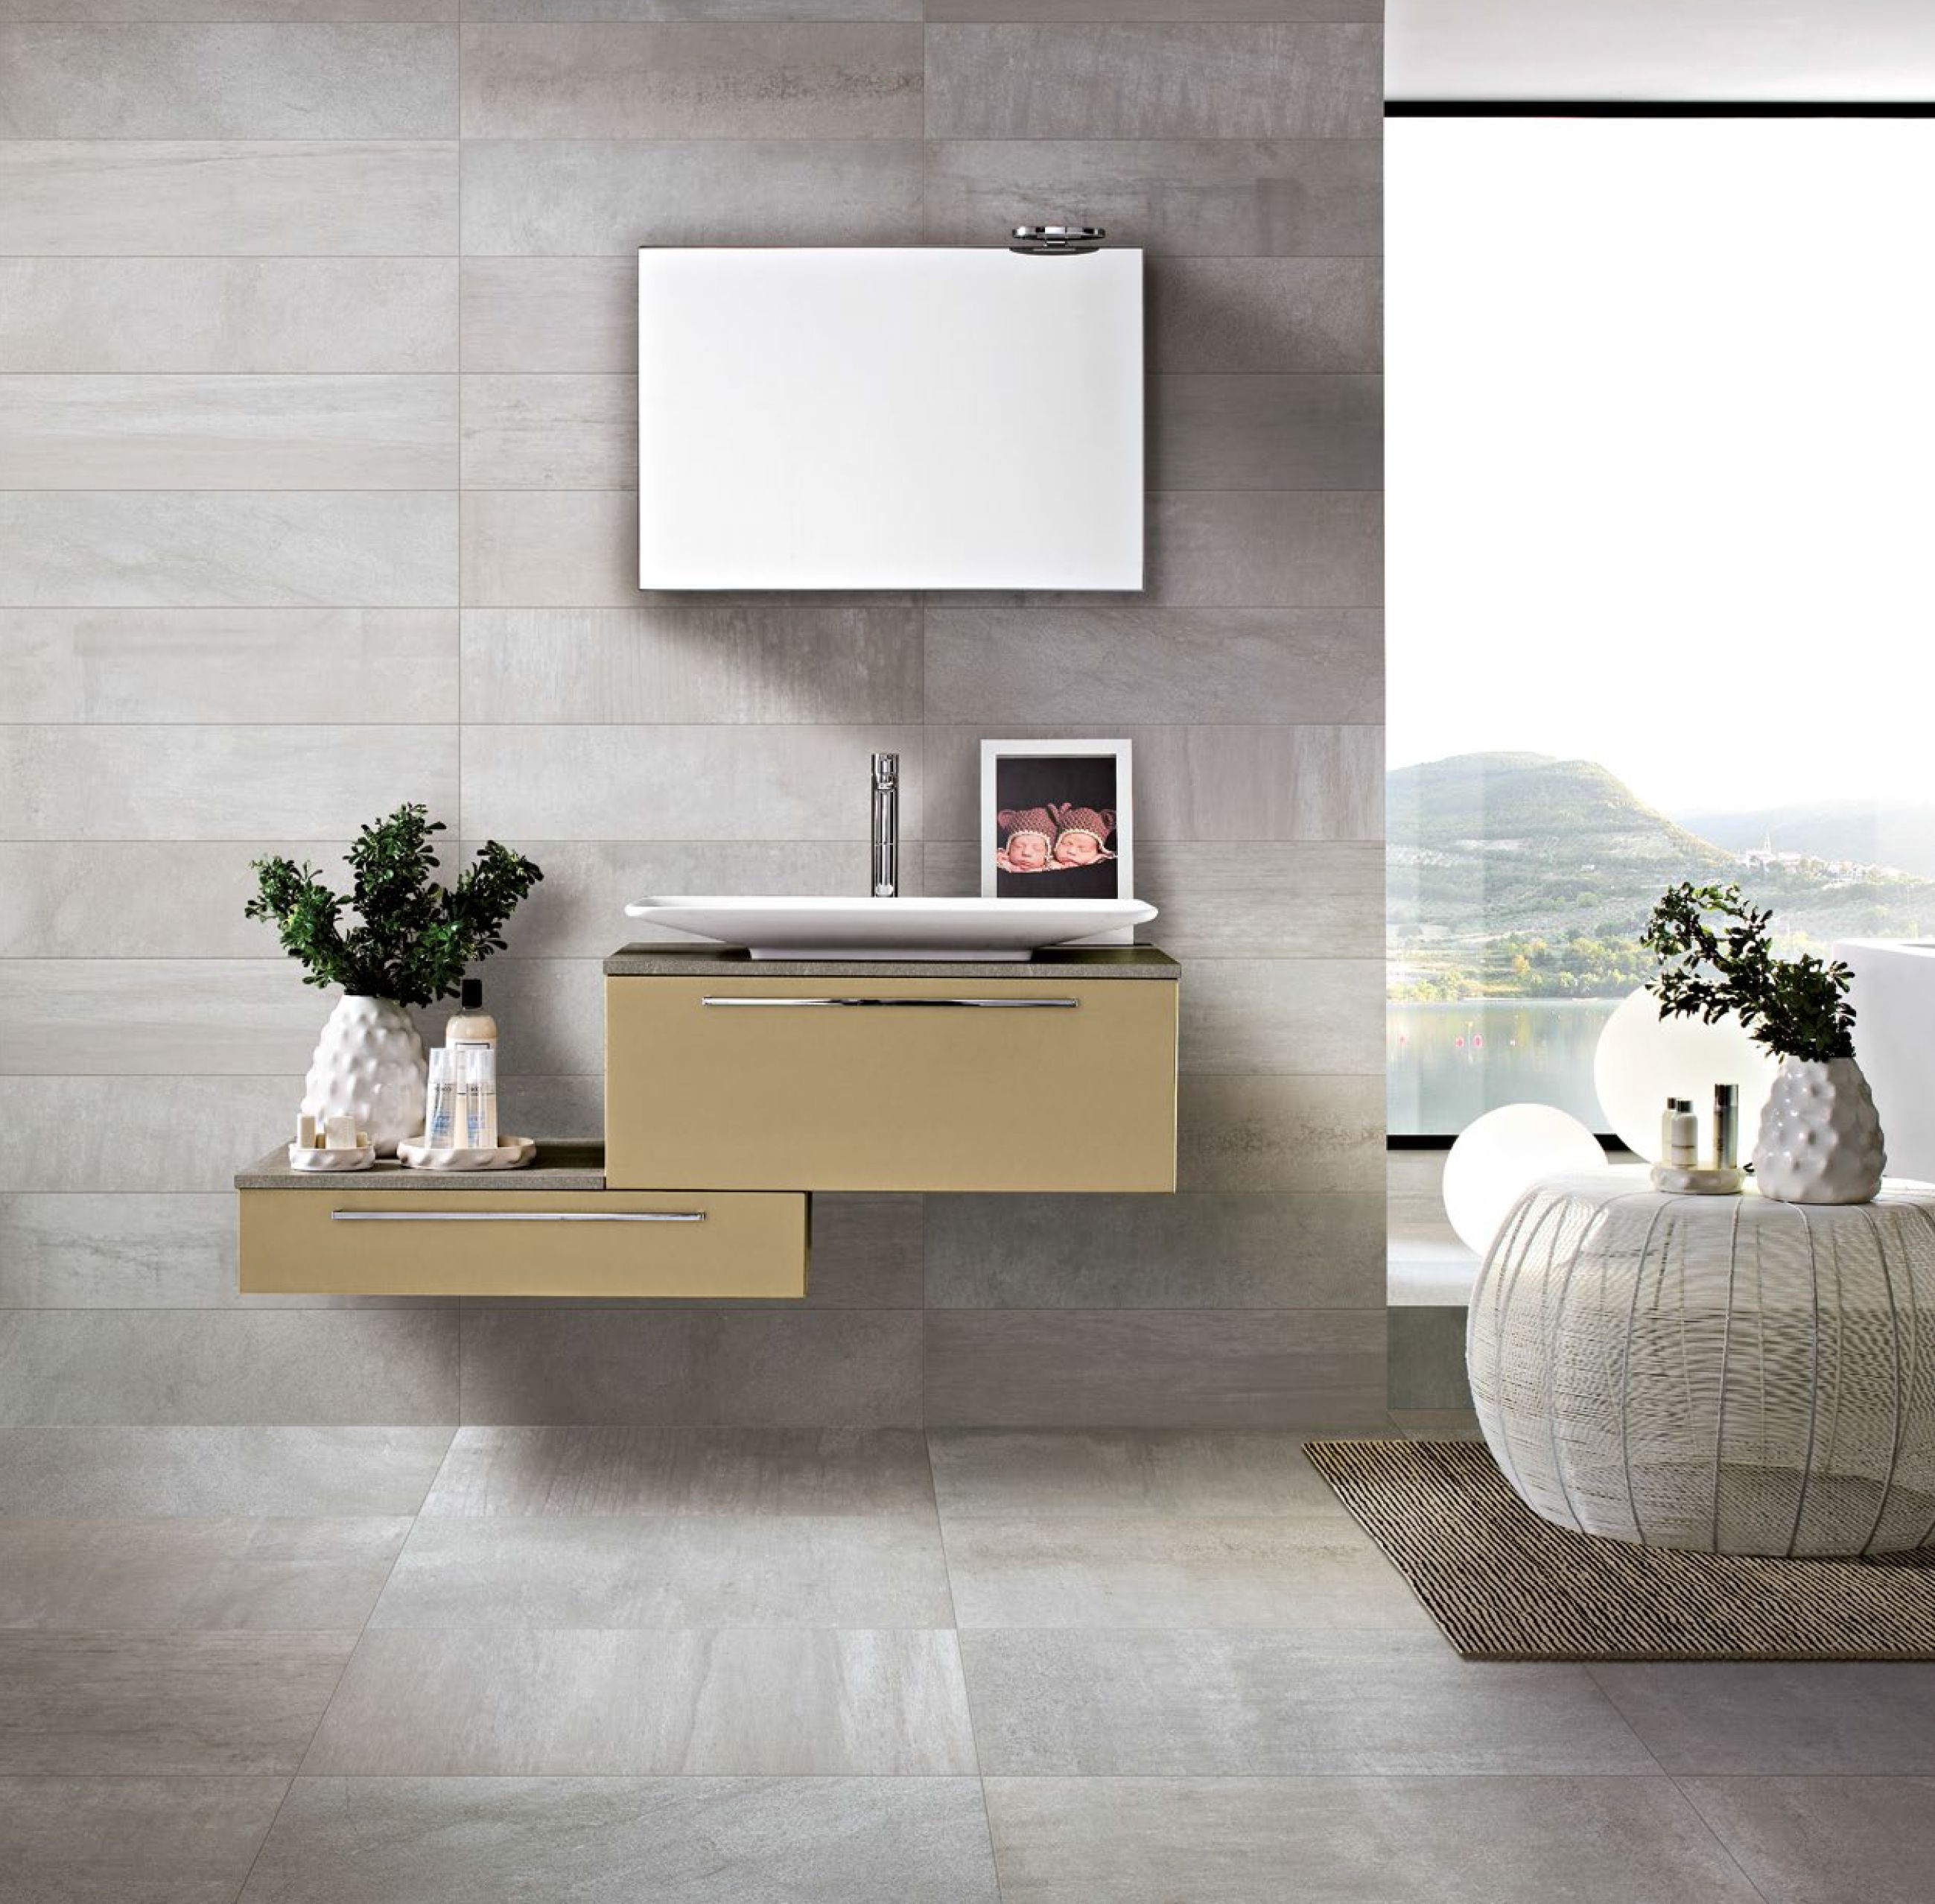 Interceramic Usa House Tiles Home And Living Home Decor